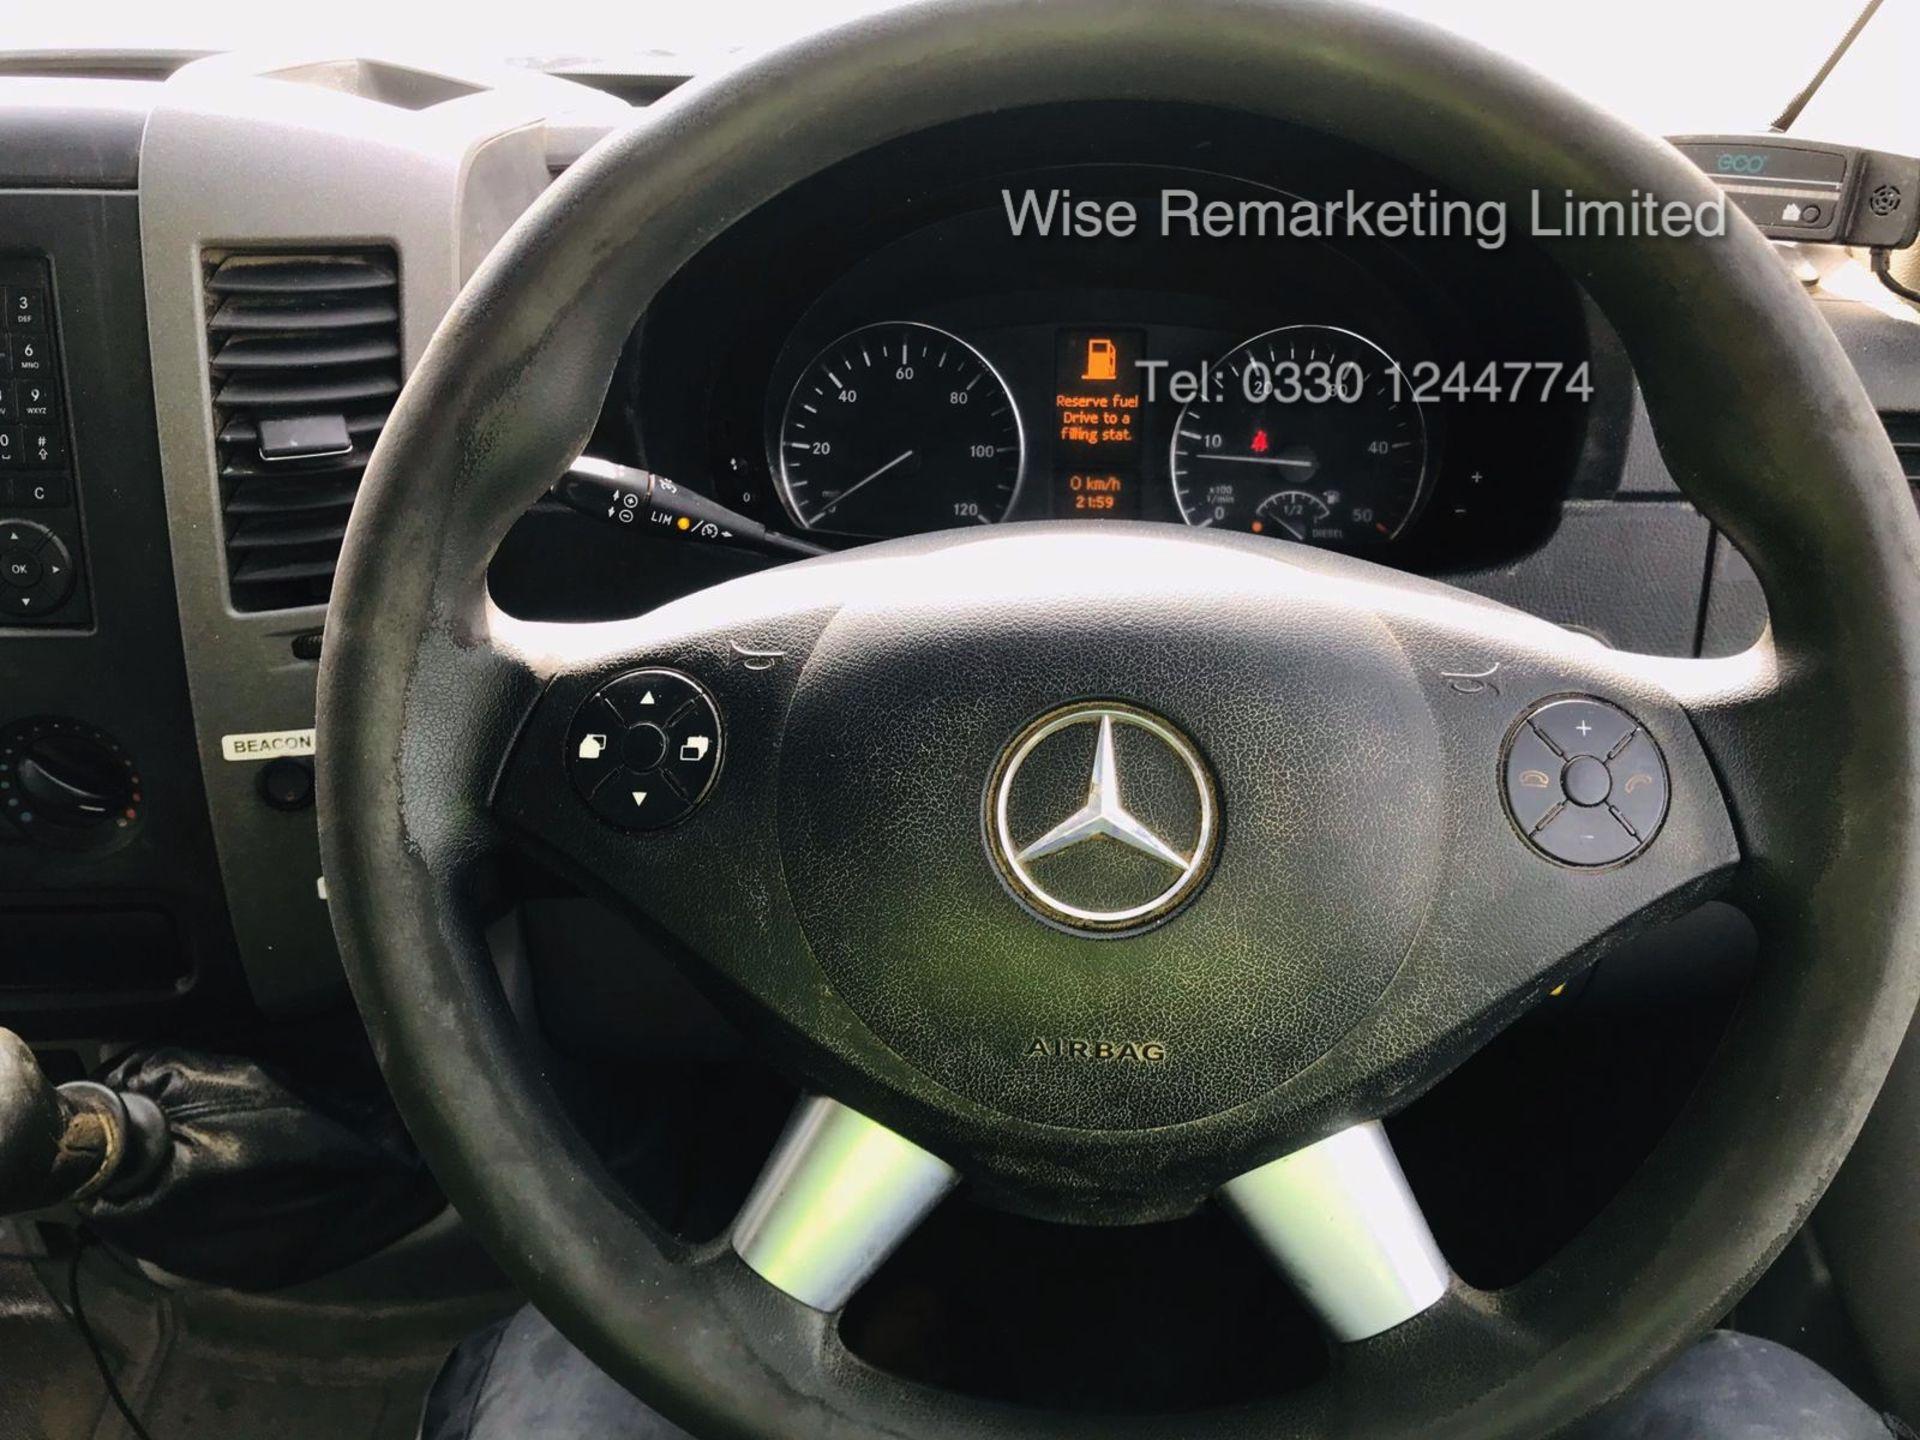 Lot 14 - Mercedes Sprinter 313 CDI (129 BHP) 2.1 TD 6 Speed - MWB High Roof - 2016 Model -